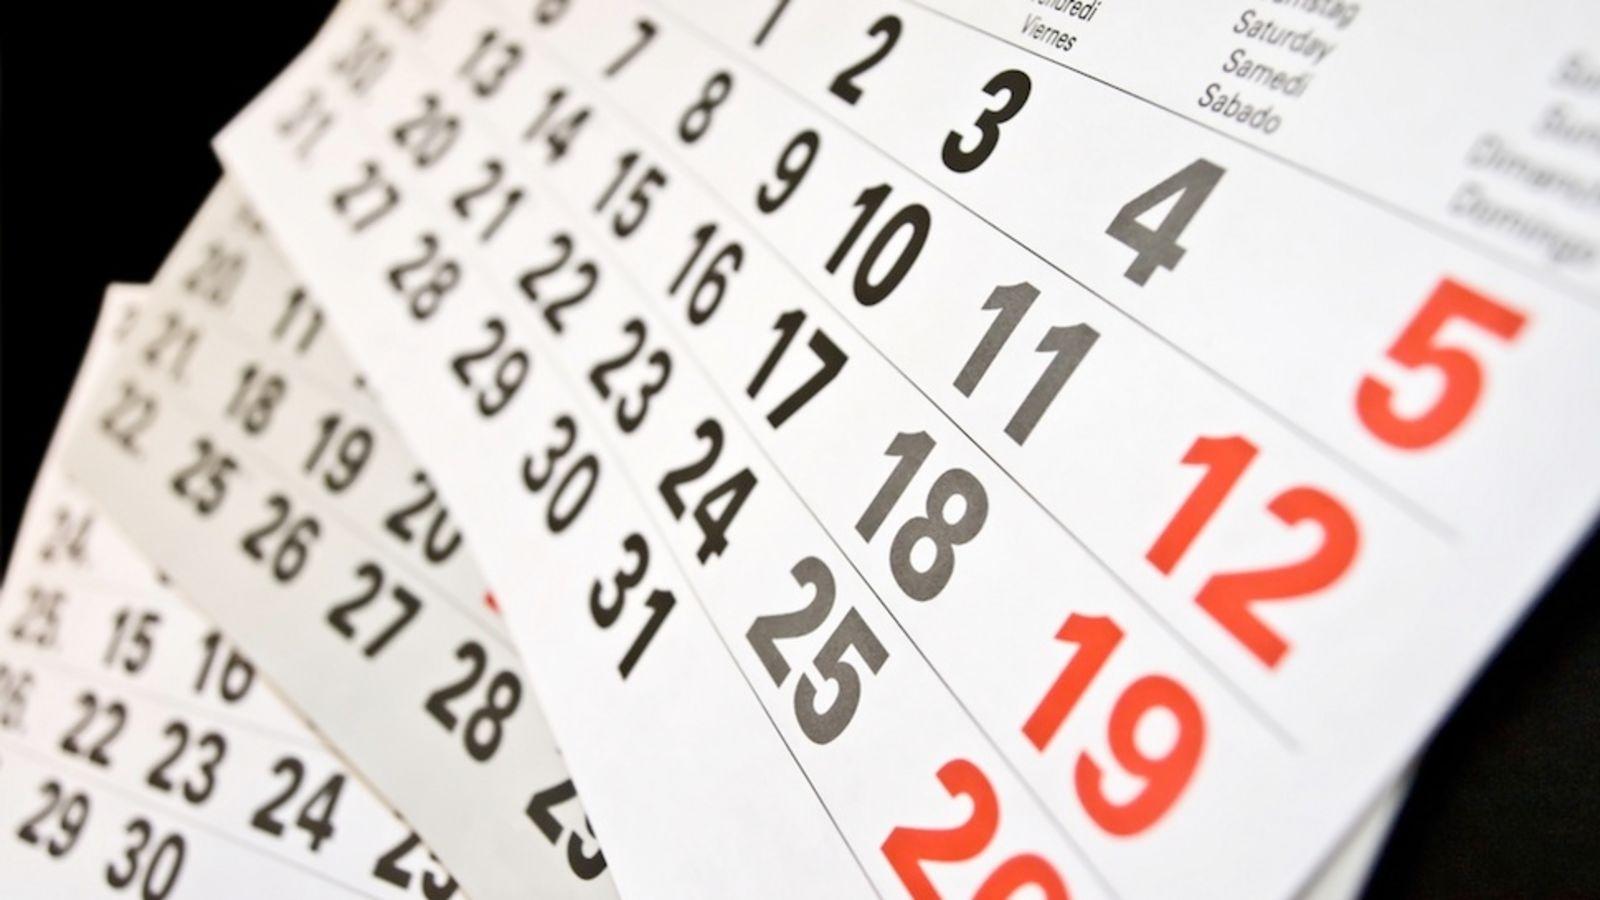 The Evolution Of The Modern Day Calendar regarding Early Civilization Calendar Based On Moon Phases